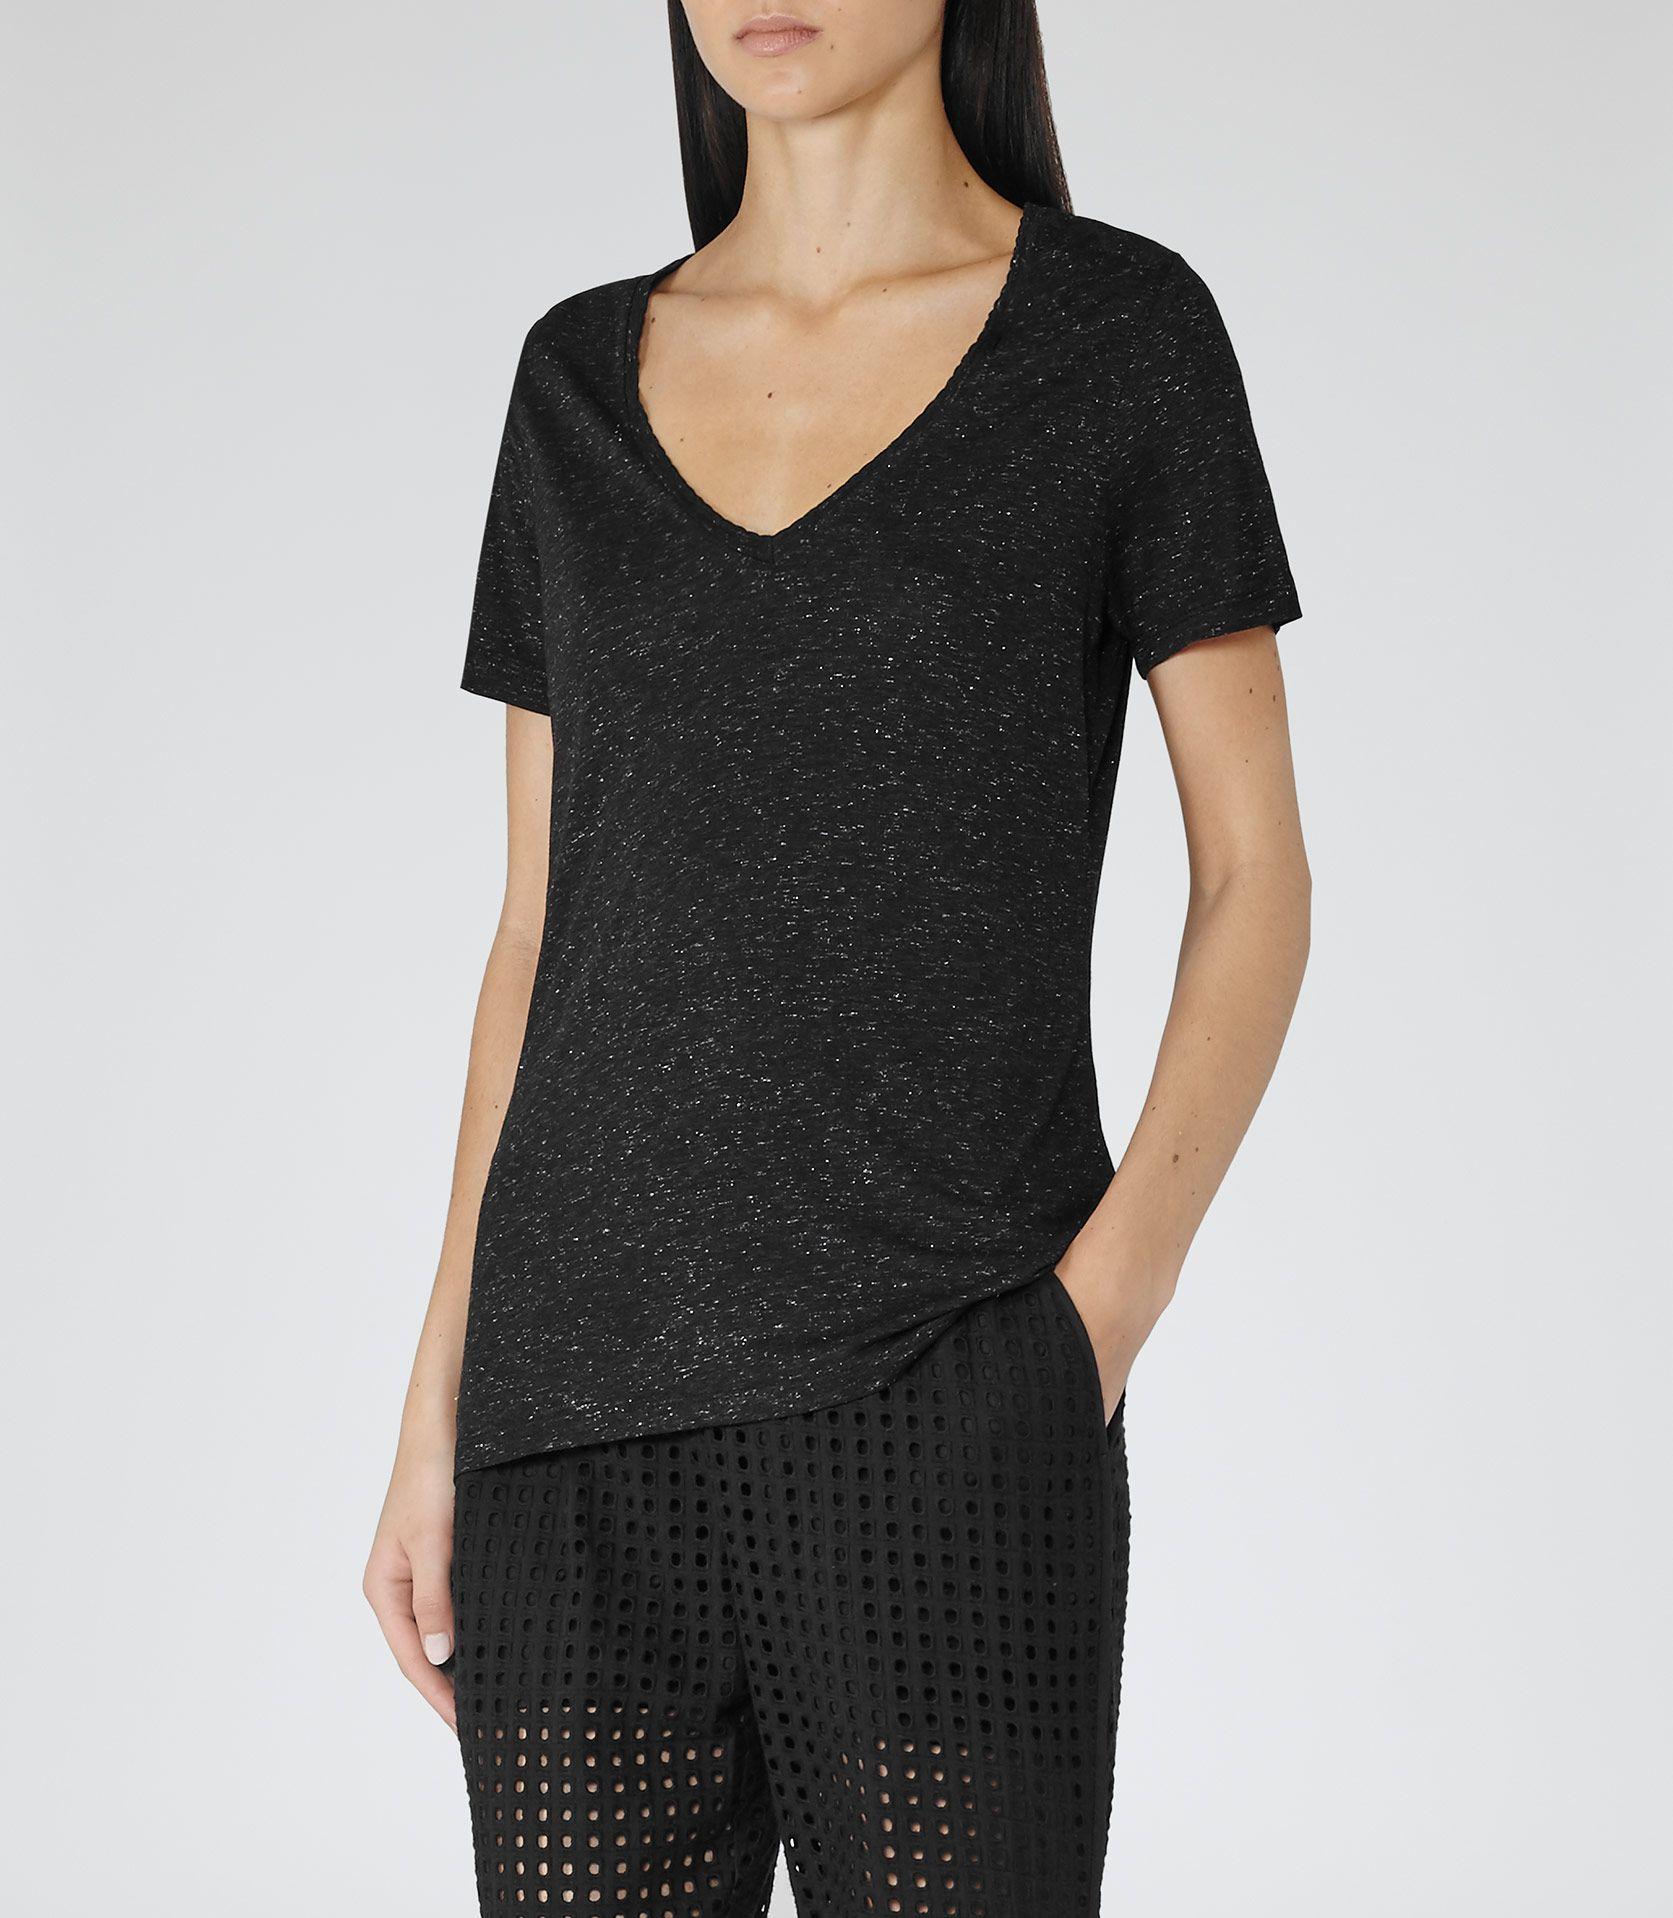 Black t shirt reiss - Womens Black Silver V Neck T Shirt Reiss Arlen